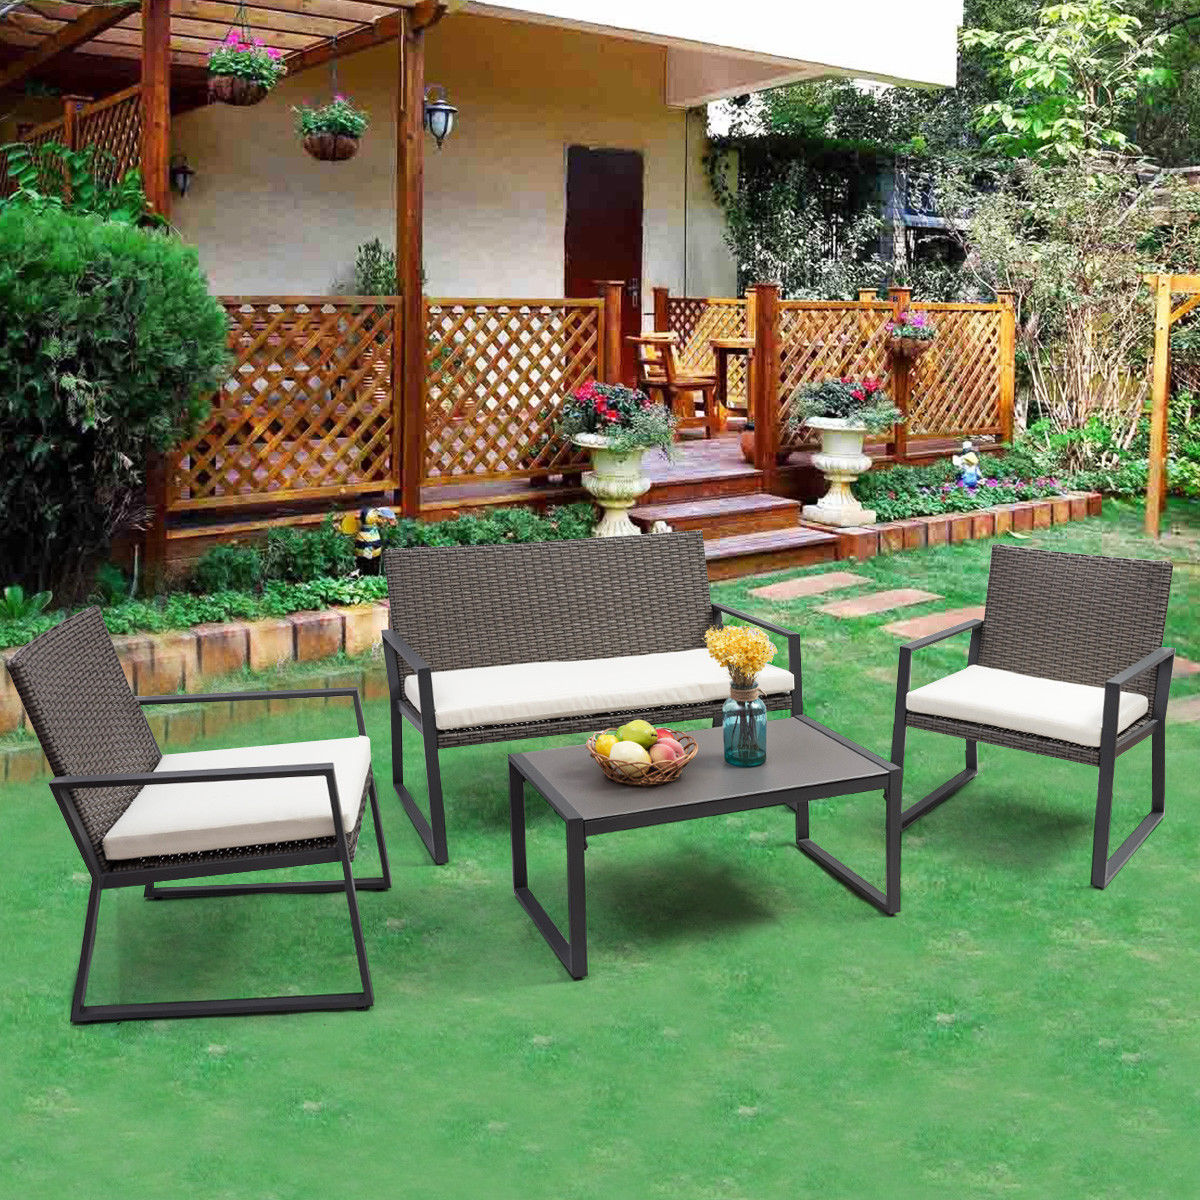 Costway 4PCS Rattan Patio Furniture Set Wicker Cushioned Seat Sofa Garden Lawn Sofa